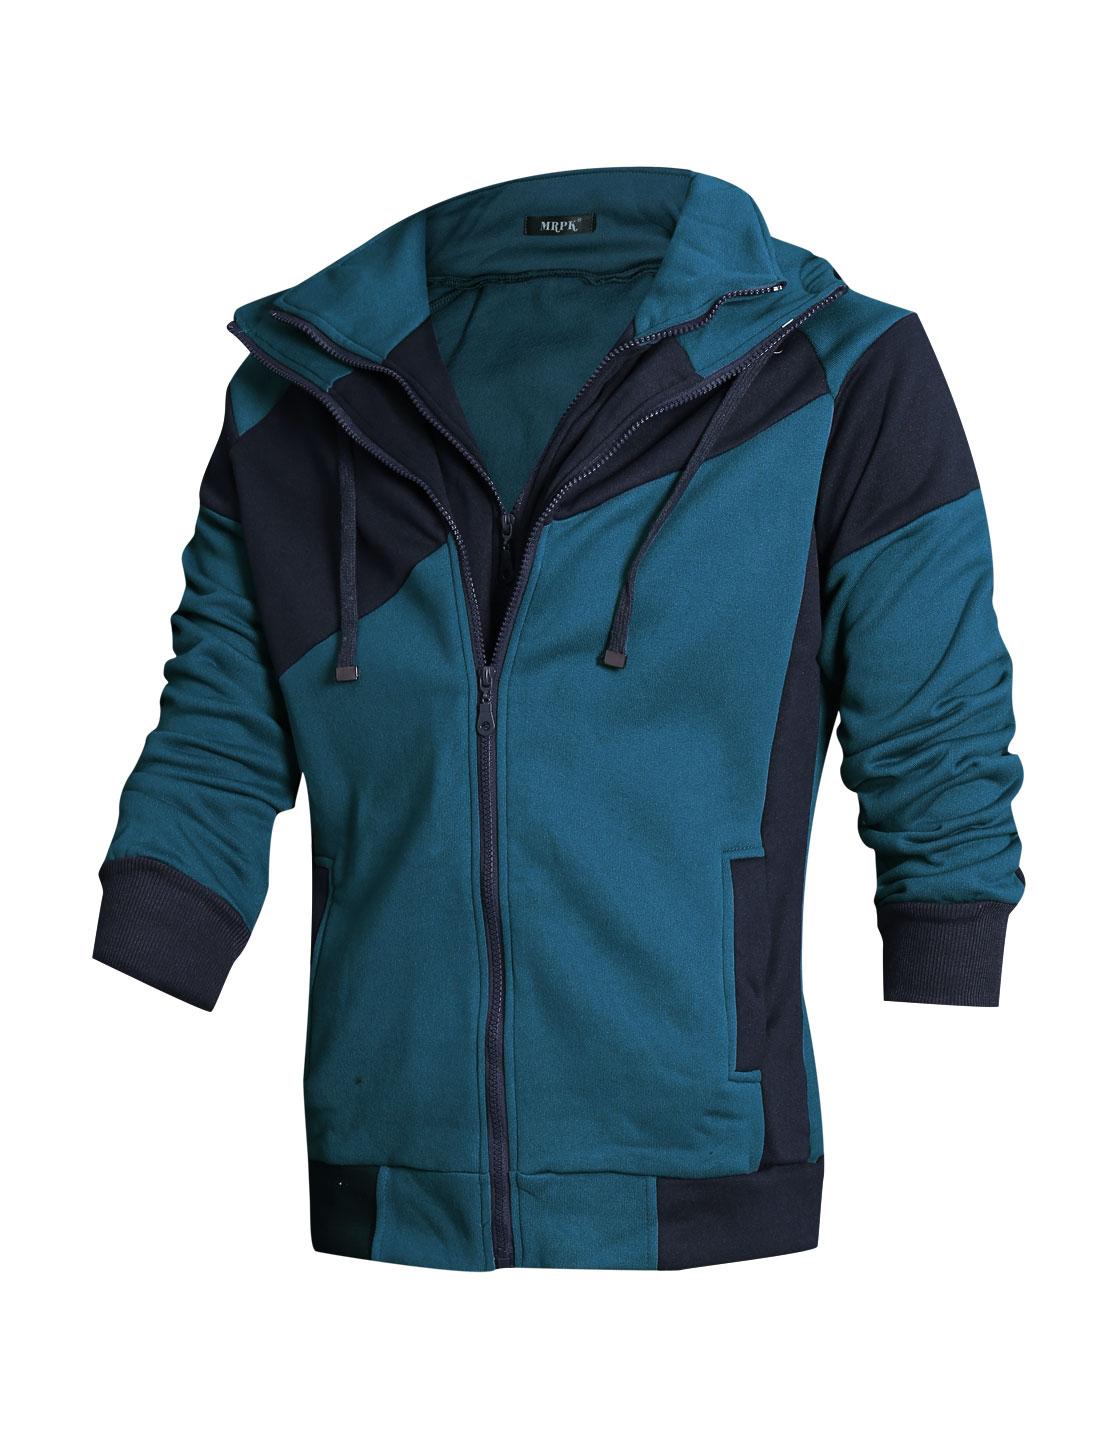 Men Contrast Color Double Zip Up Long Sleeve Jacket Navy Blue M